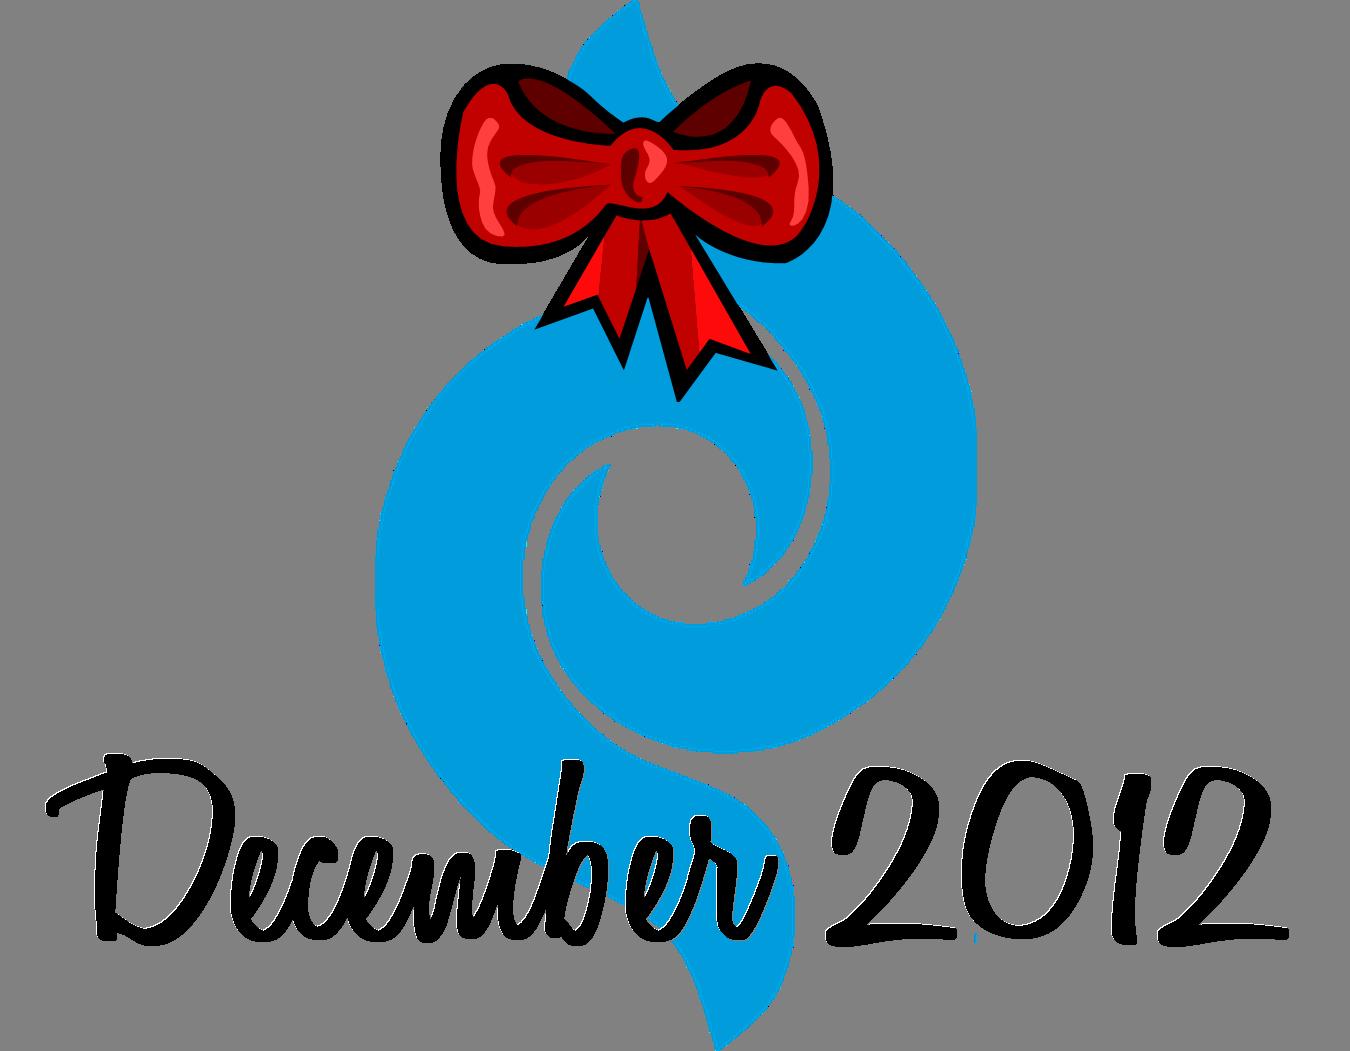 Nursing clipart psychiatric nurse. December american nurses association